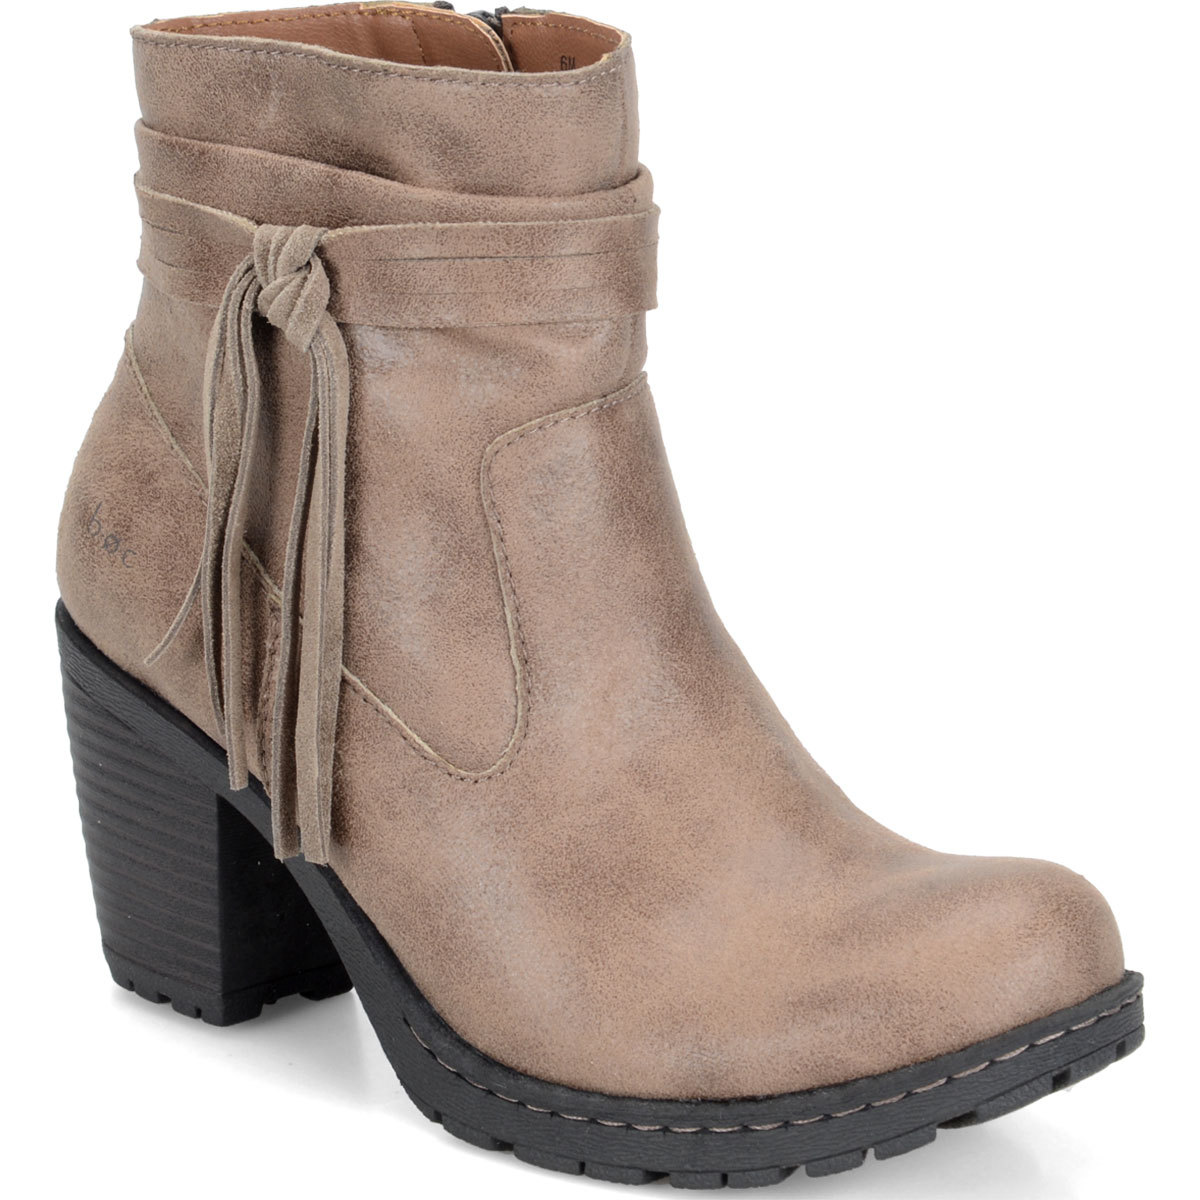 Boc Women's Alicudi Tassel Booties - Brown, 8.5